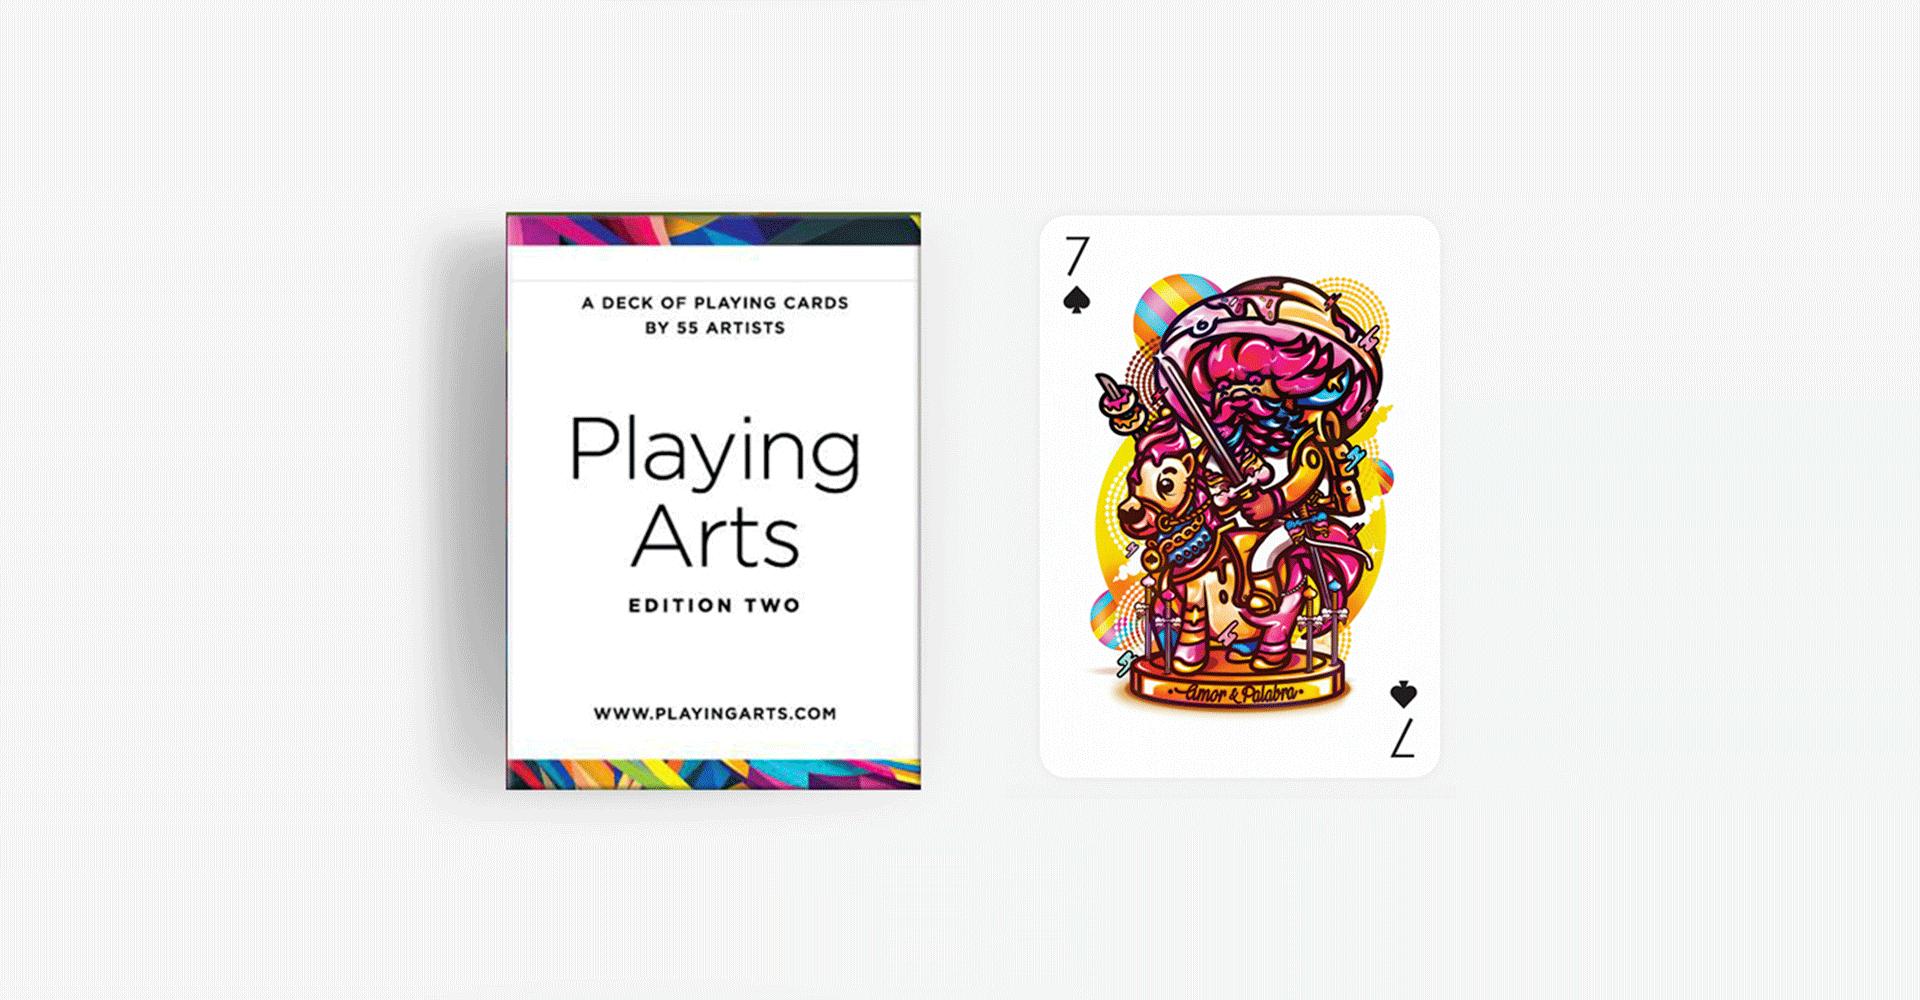 PALYING-arts-poker-chocotoy.png